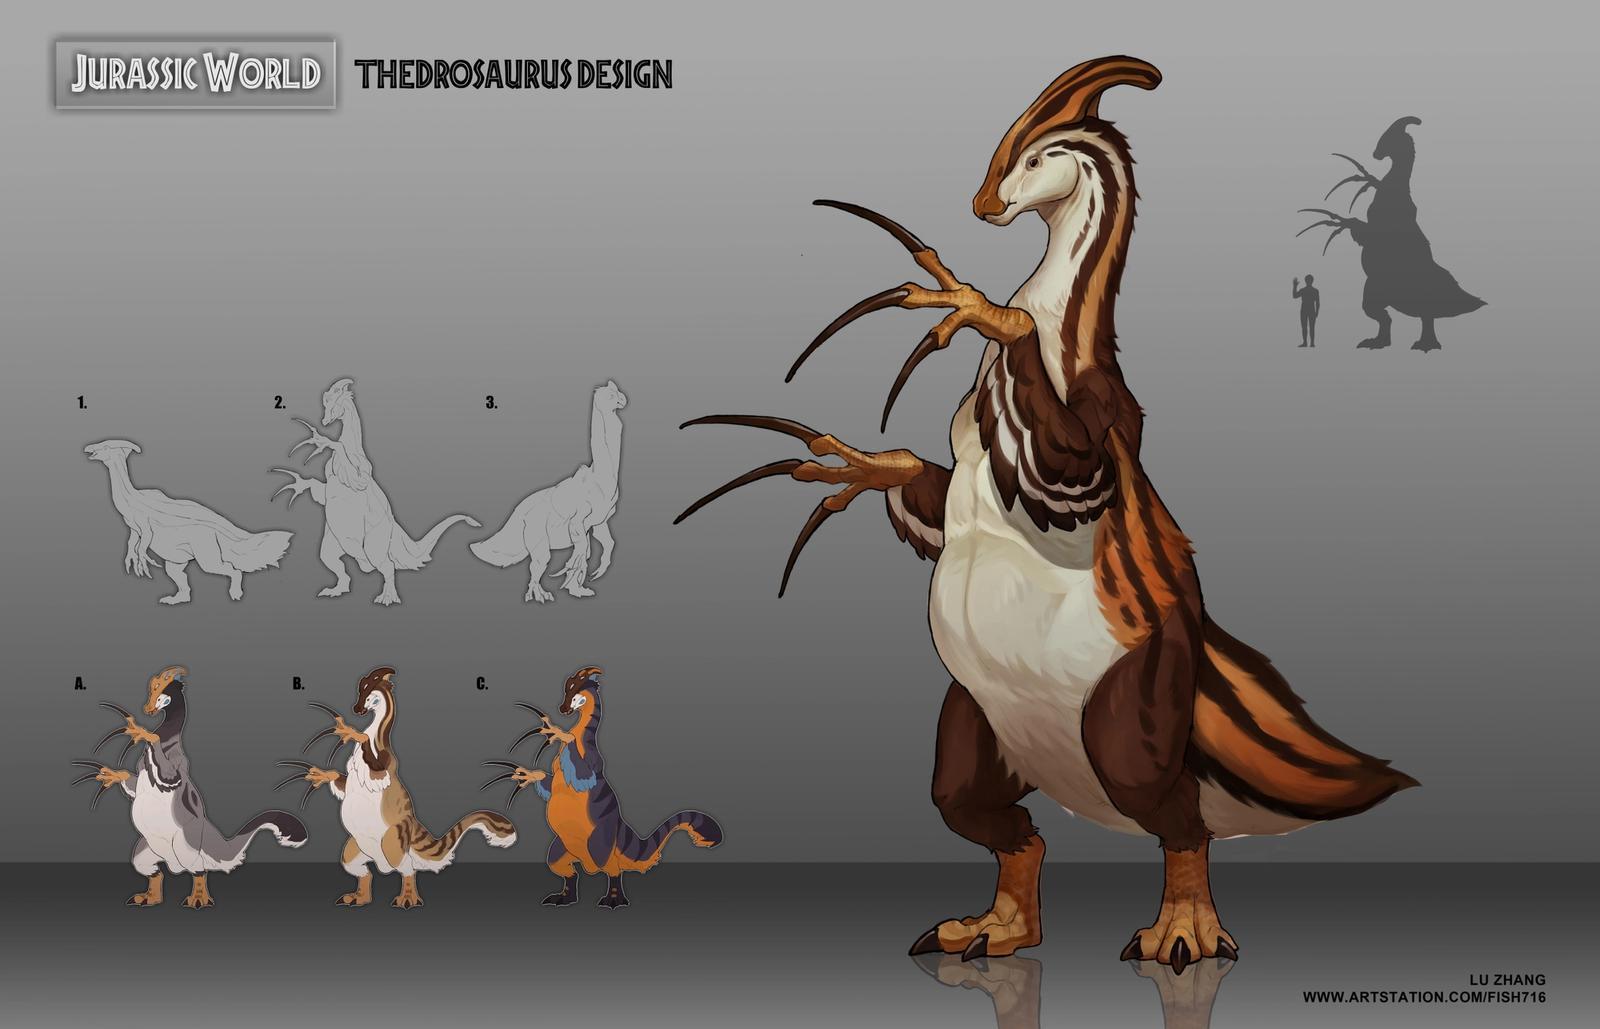 Jurrasic World - Thedrosaurus